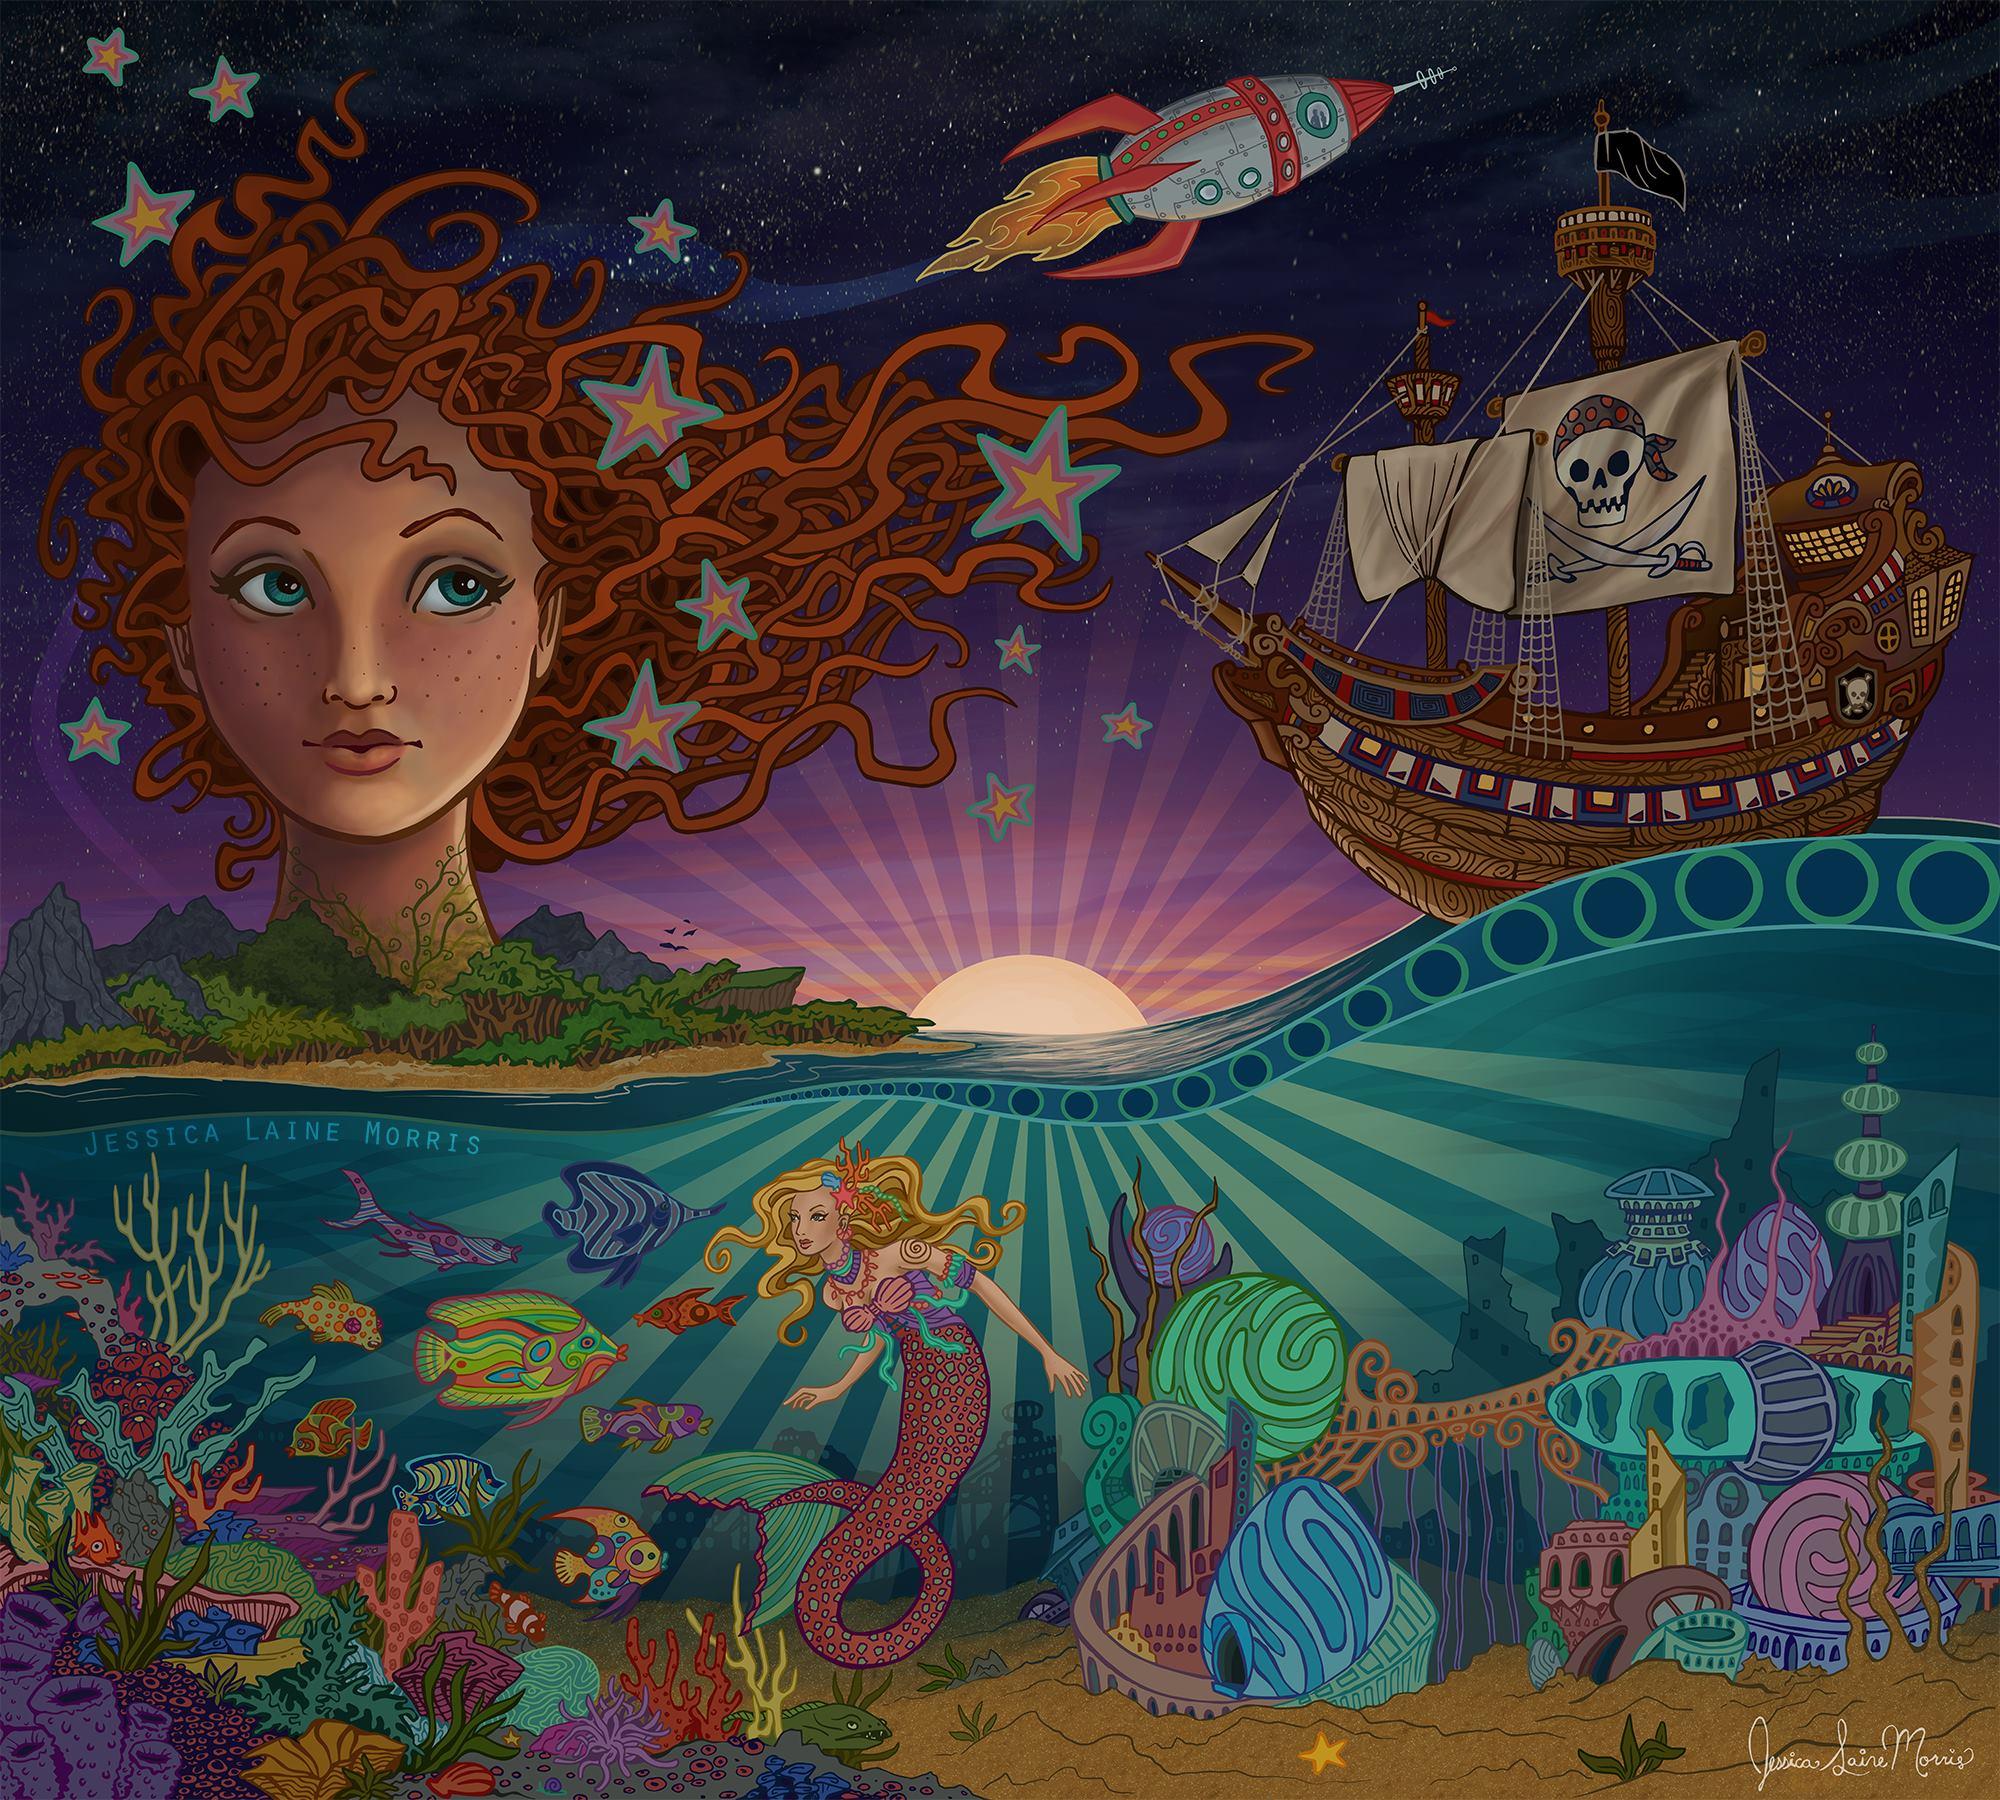 Mermaids and pirates Imagination mural. Brownsburg Public Library. Childrens book fantasy illustration.